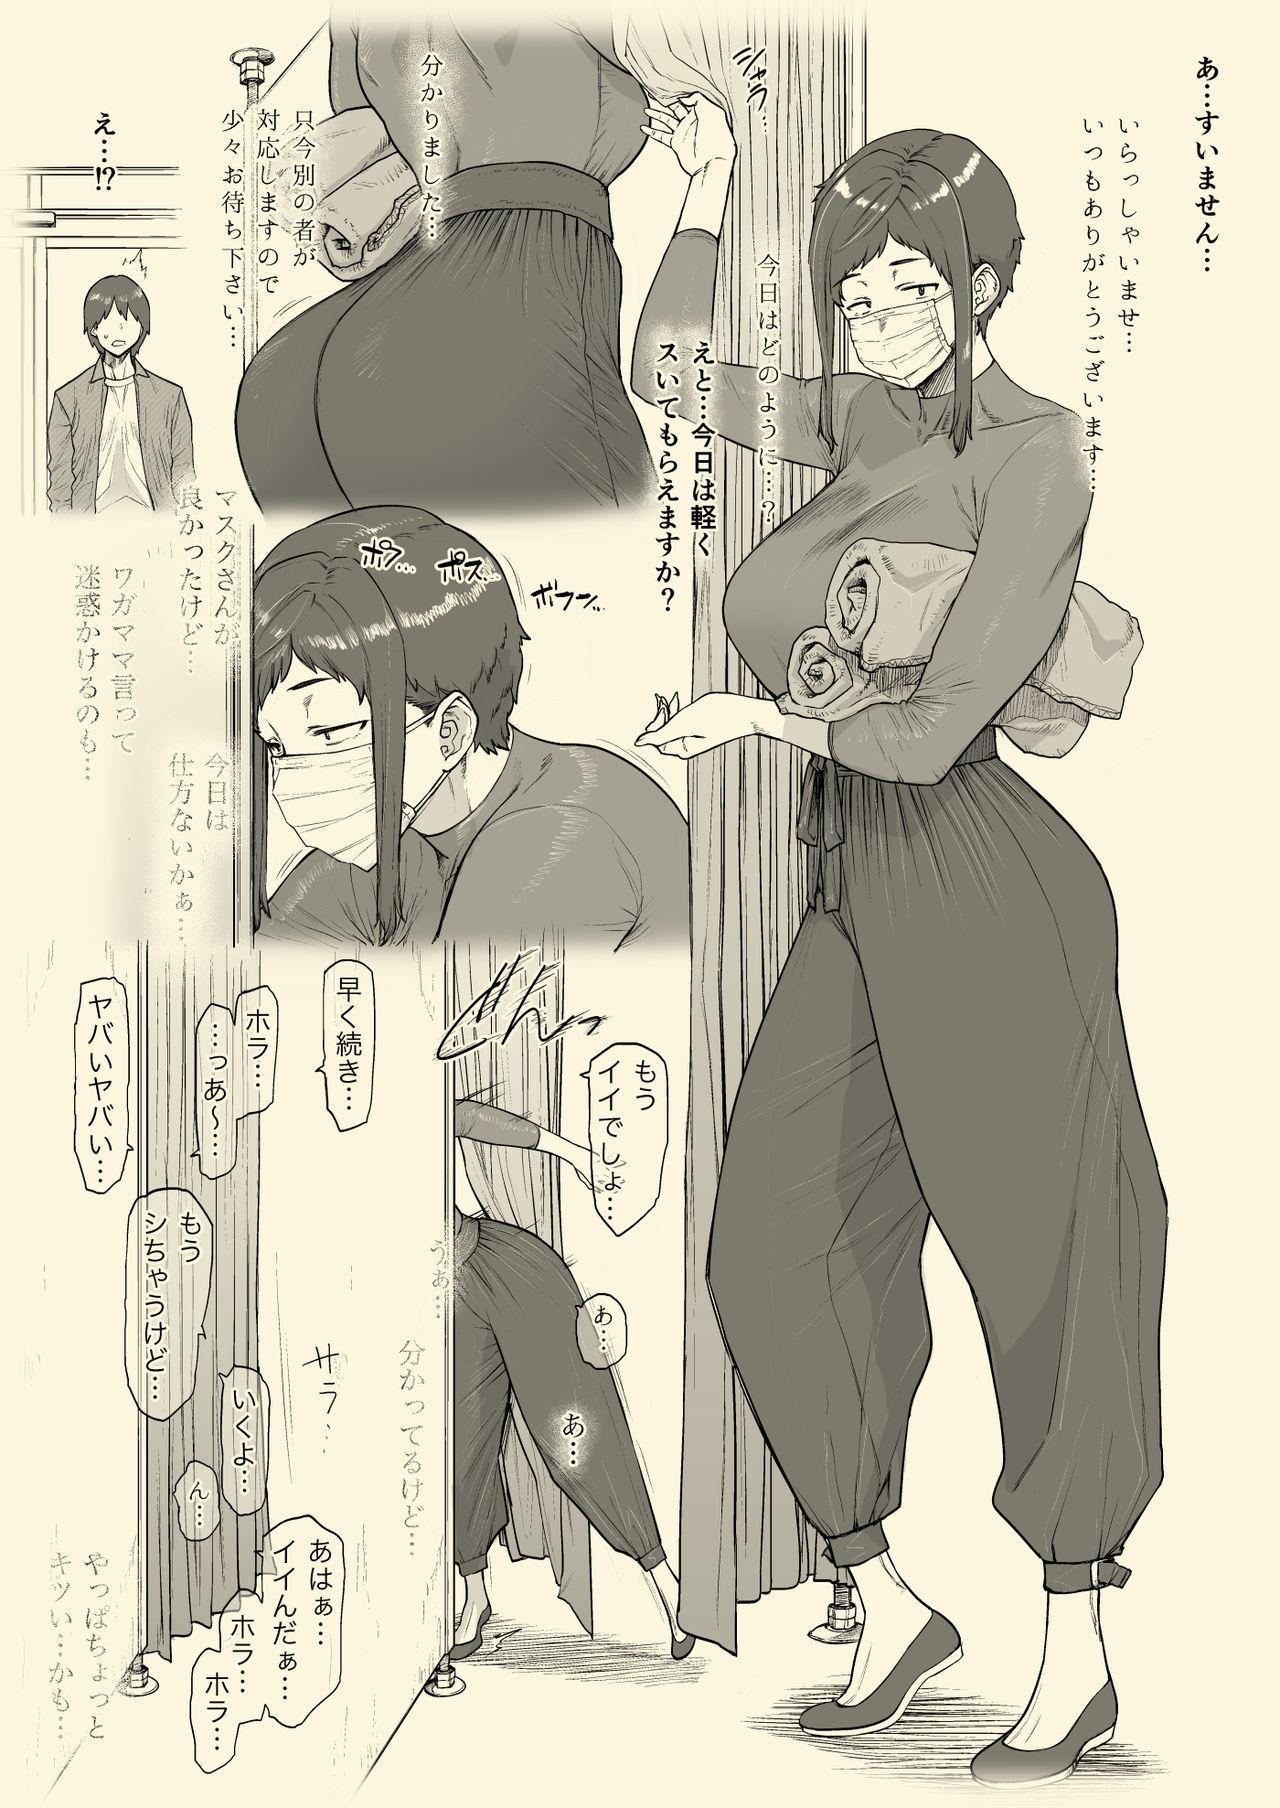 1000 Yen Cut no Onee-san ni Suite Morau Hon. II 2